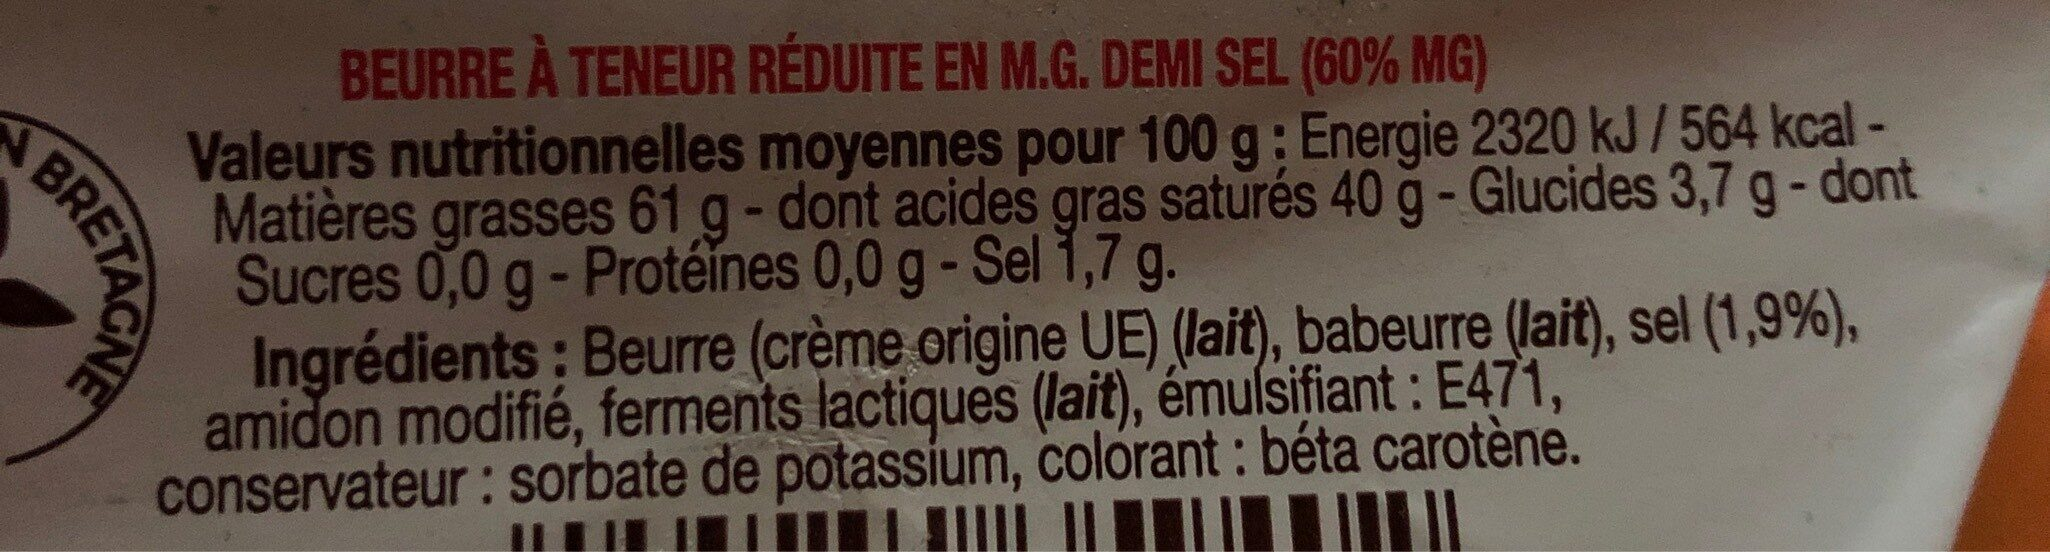 Beurre demi-sel - Valori nutrizionali - fr